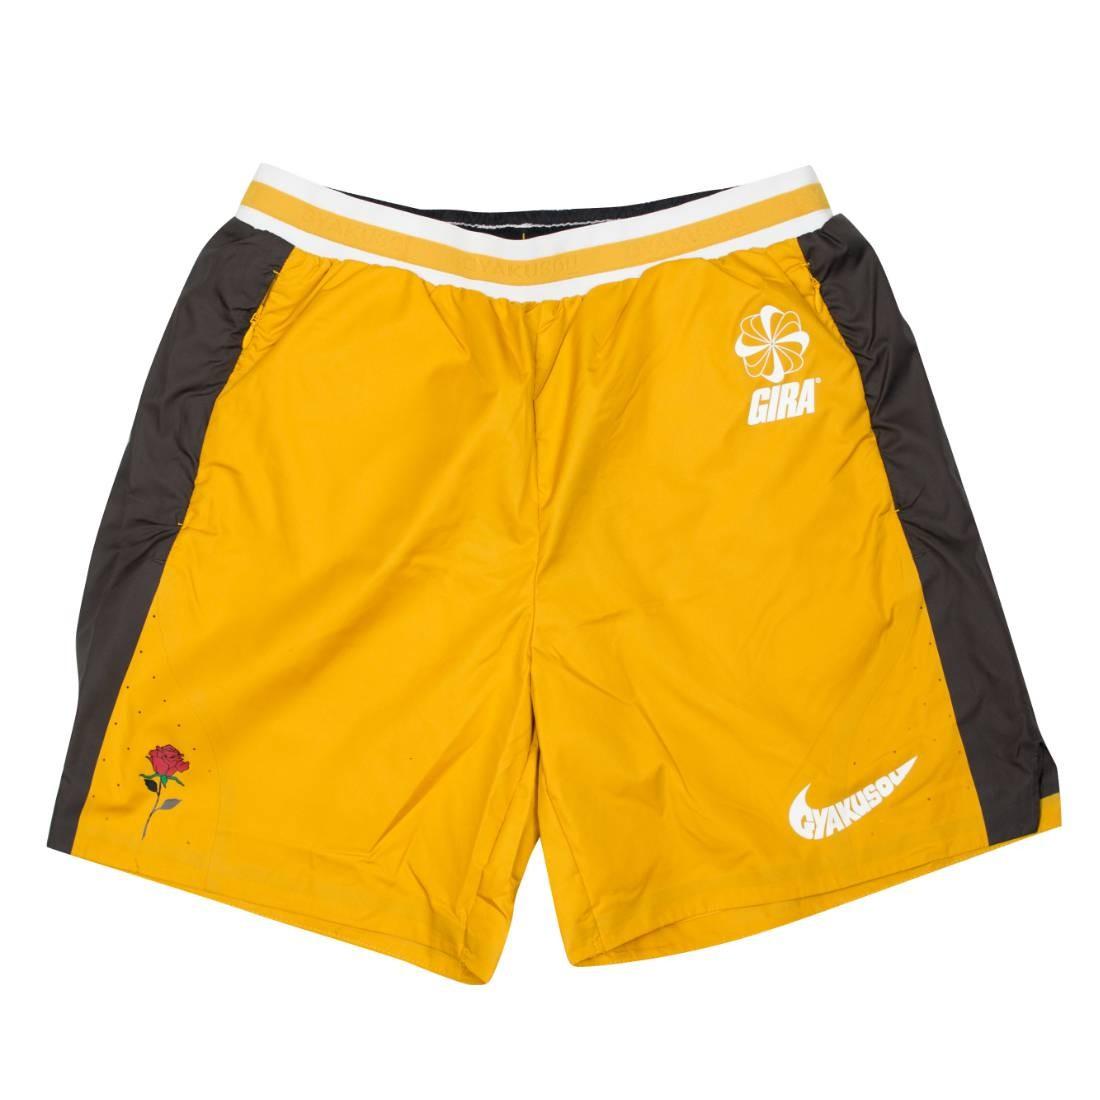 Nike Men Nrg Na Utility Shorts - Gyakusou (mineral yellow / deep pewter / sail)